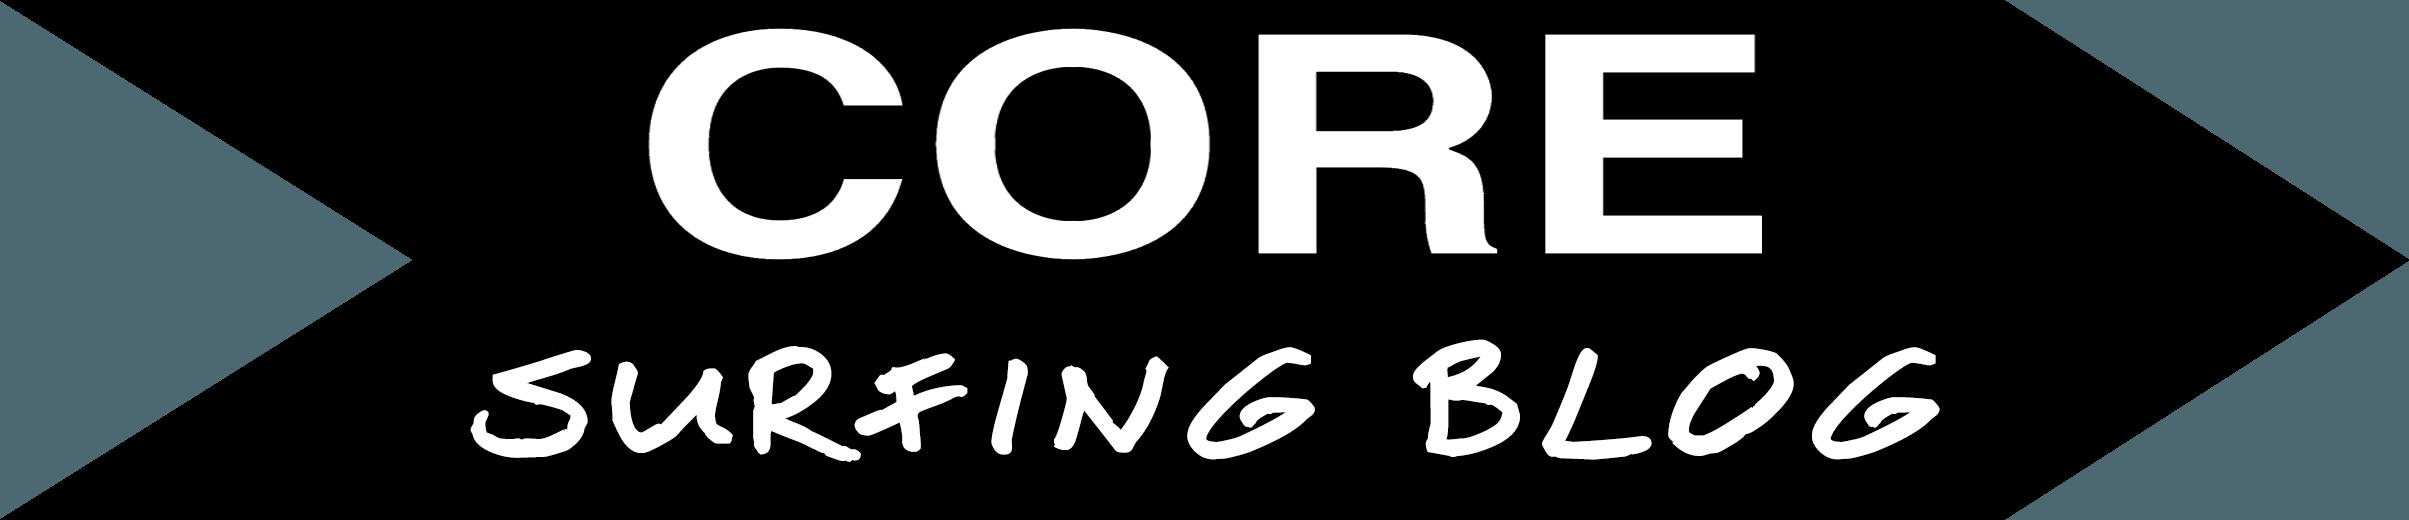 core surfing blog surf